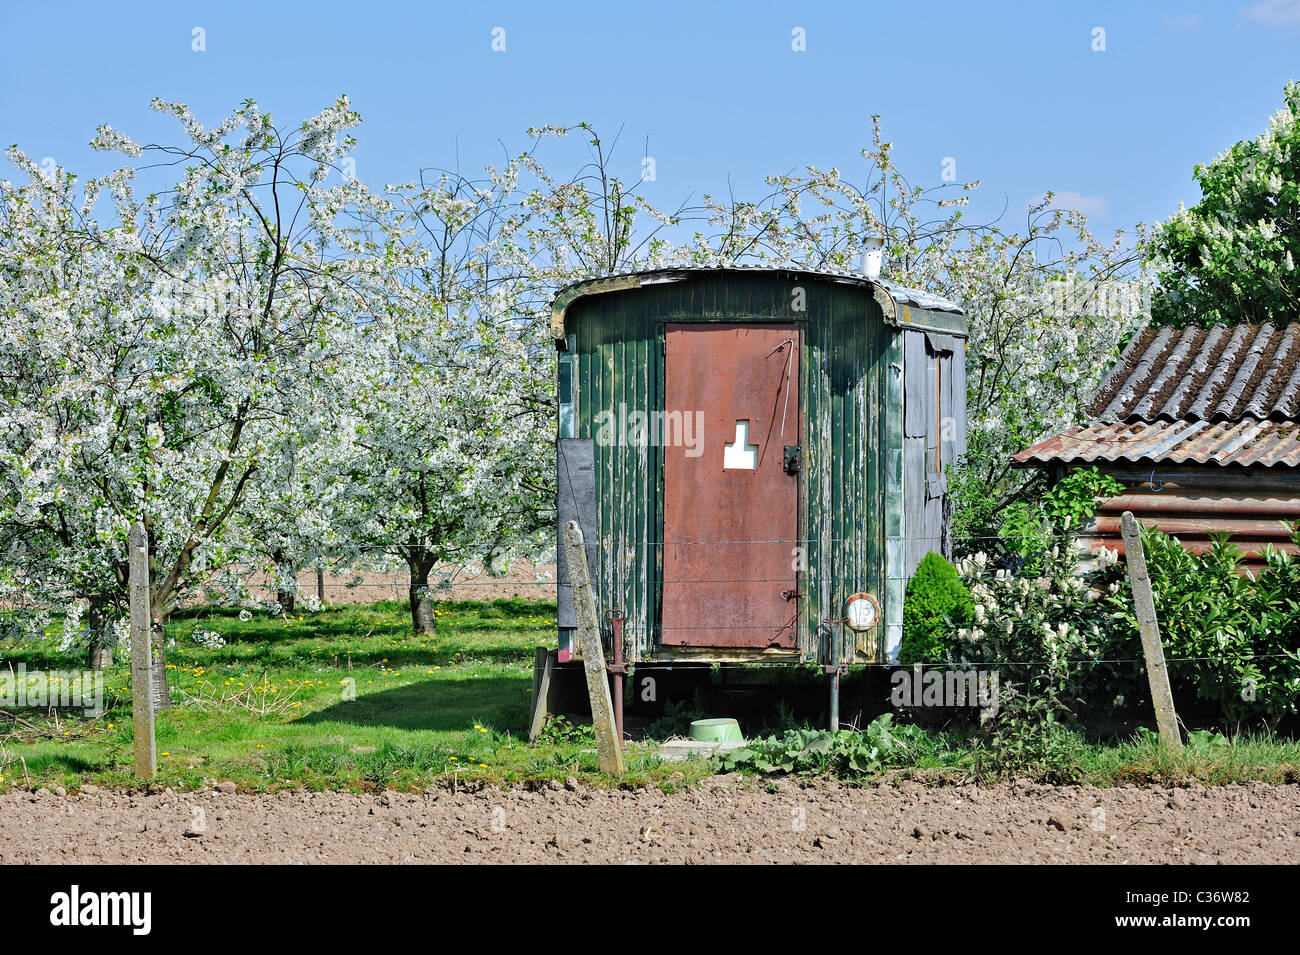 Shack and half-standard apple tree (Malus domestica) orchard flowering in spring, Hesbaye, Belgium - Stock Image